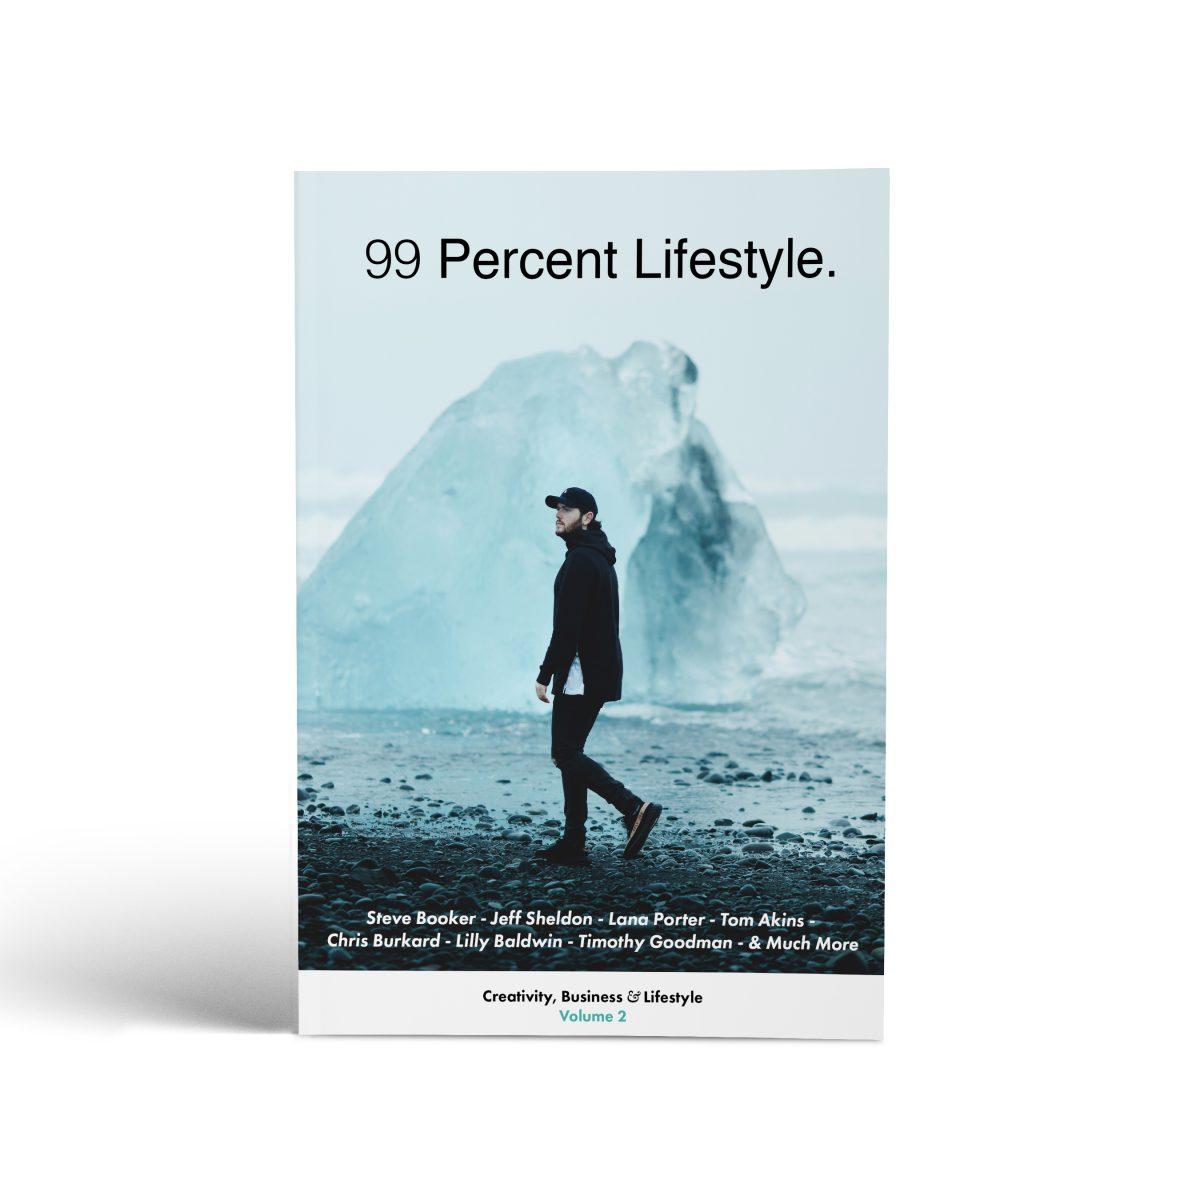 Volume 2 of 99 Percent Lifestyle